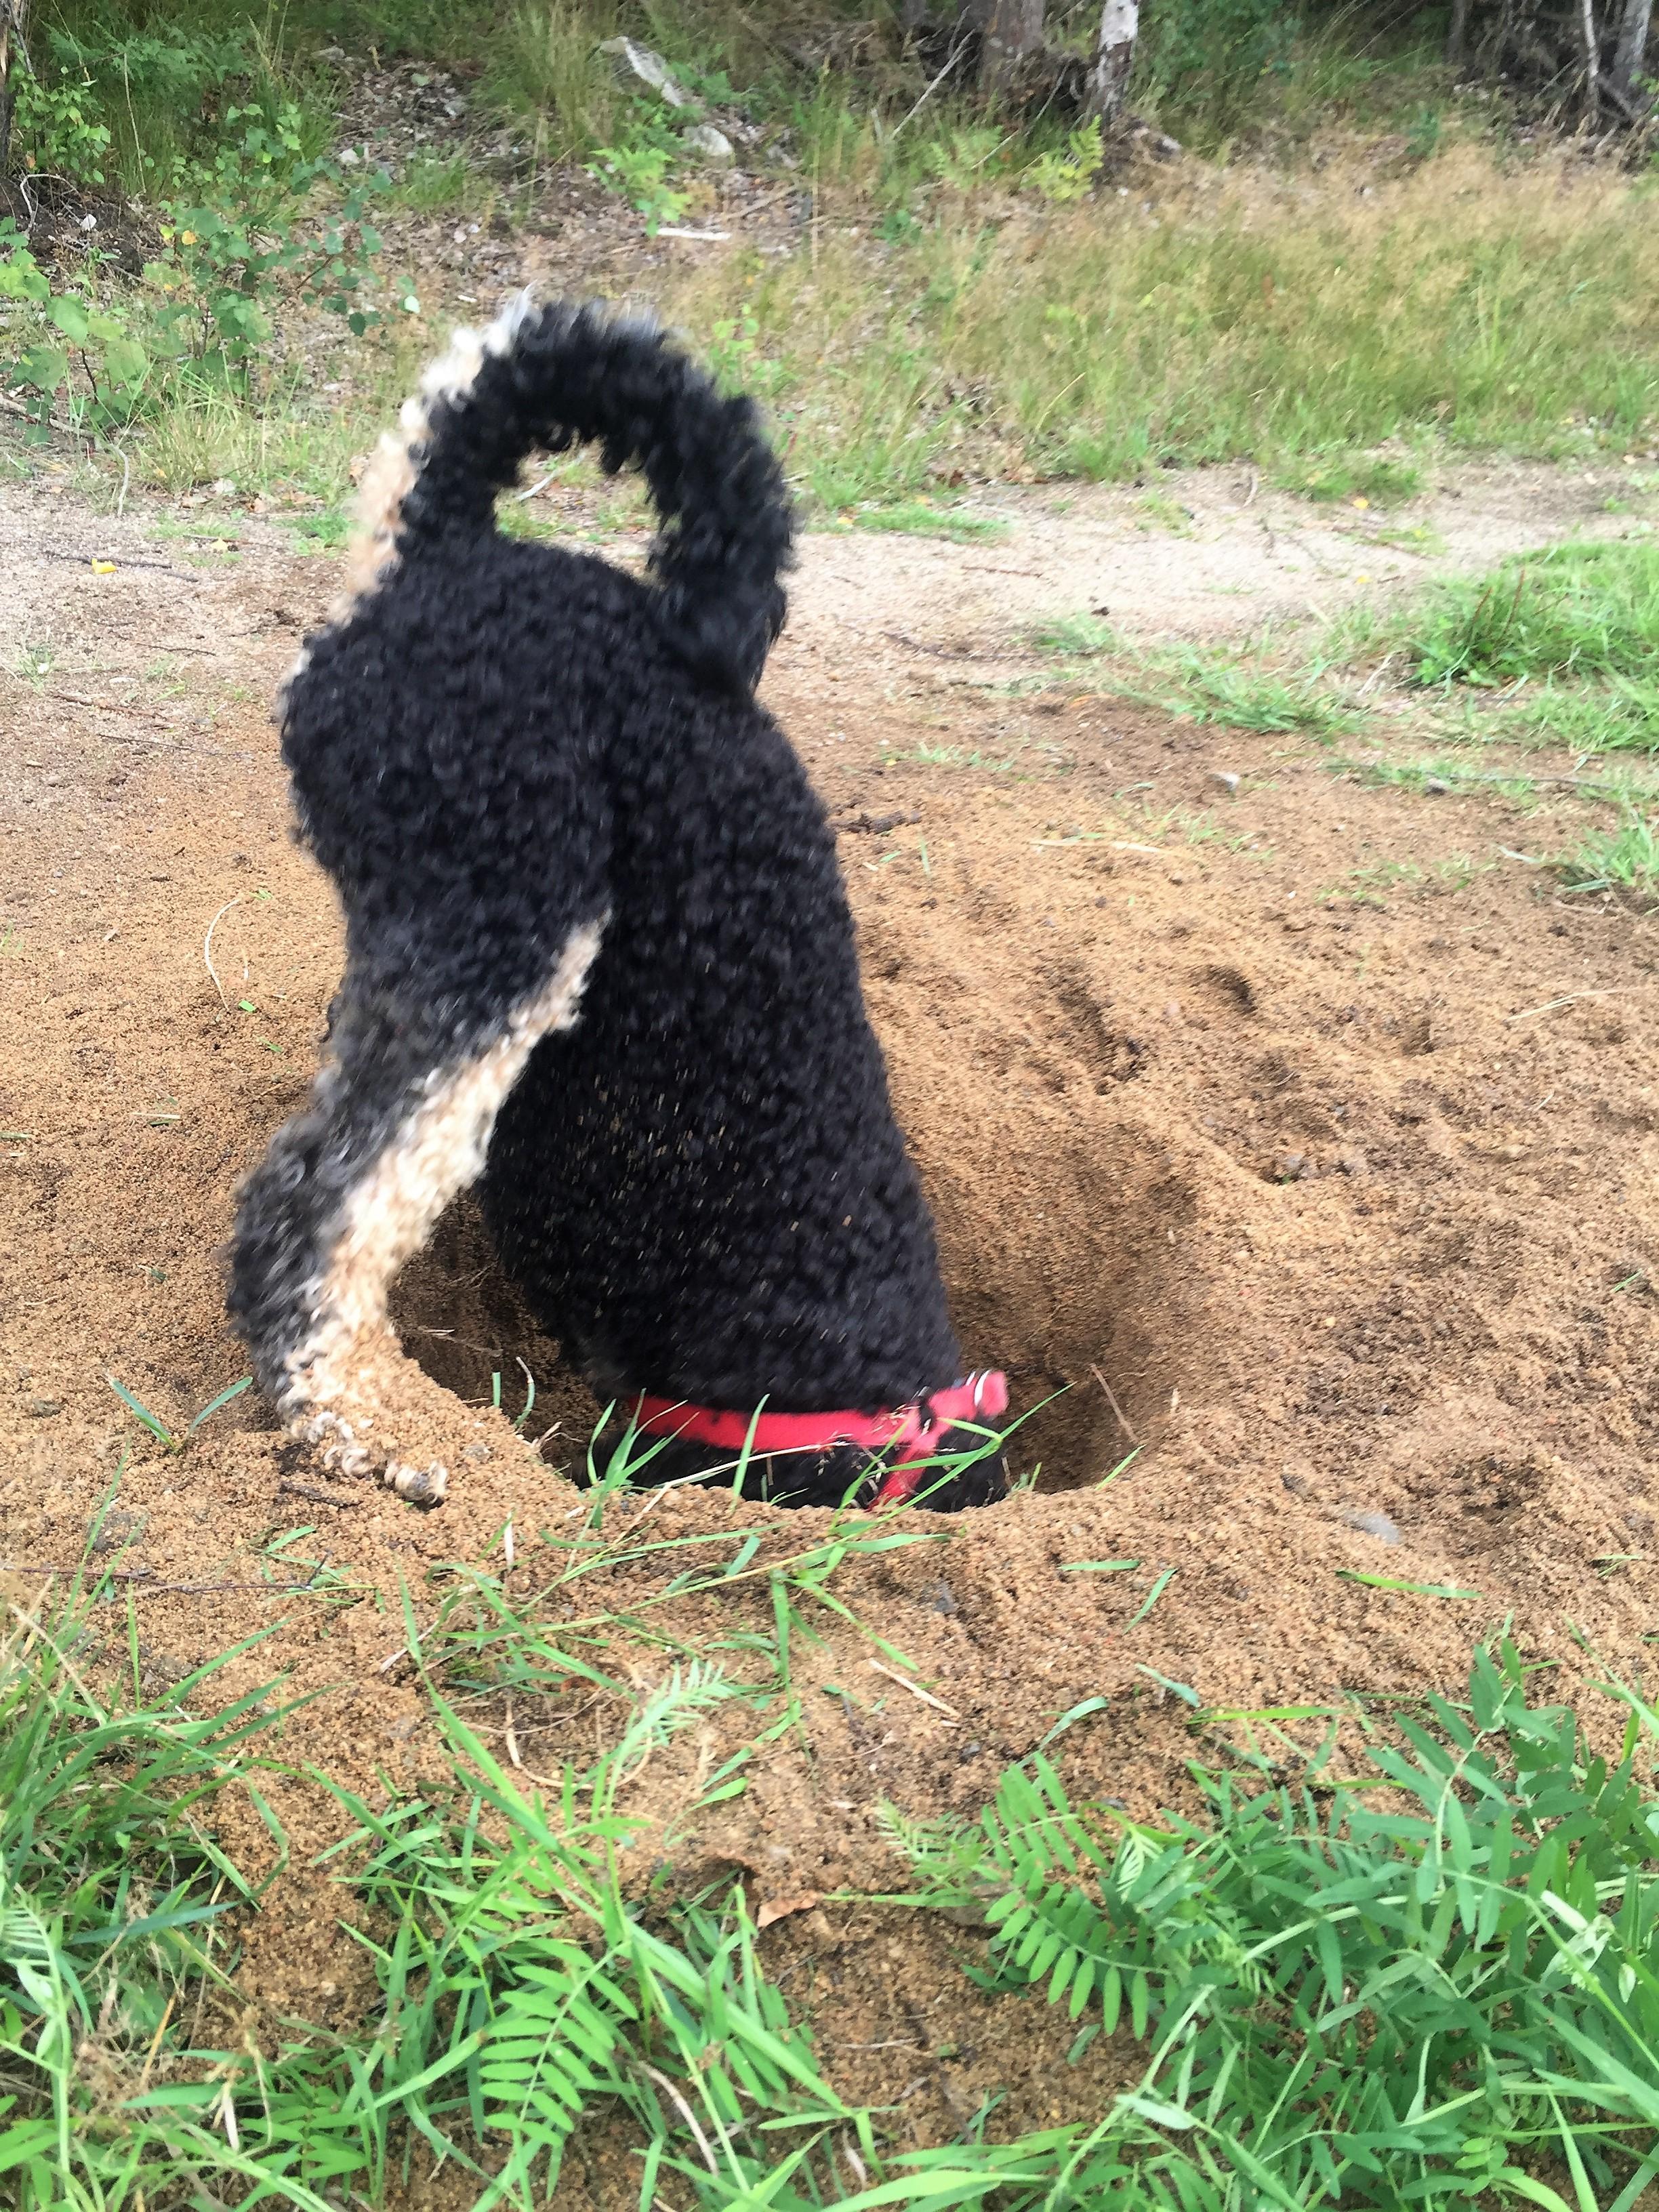 Dog digs big hole in Swedish forest